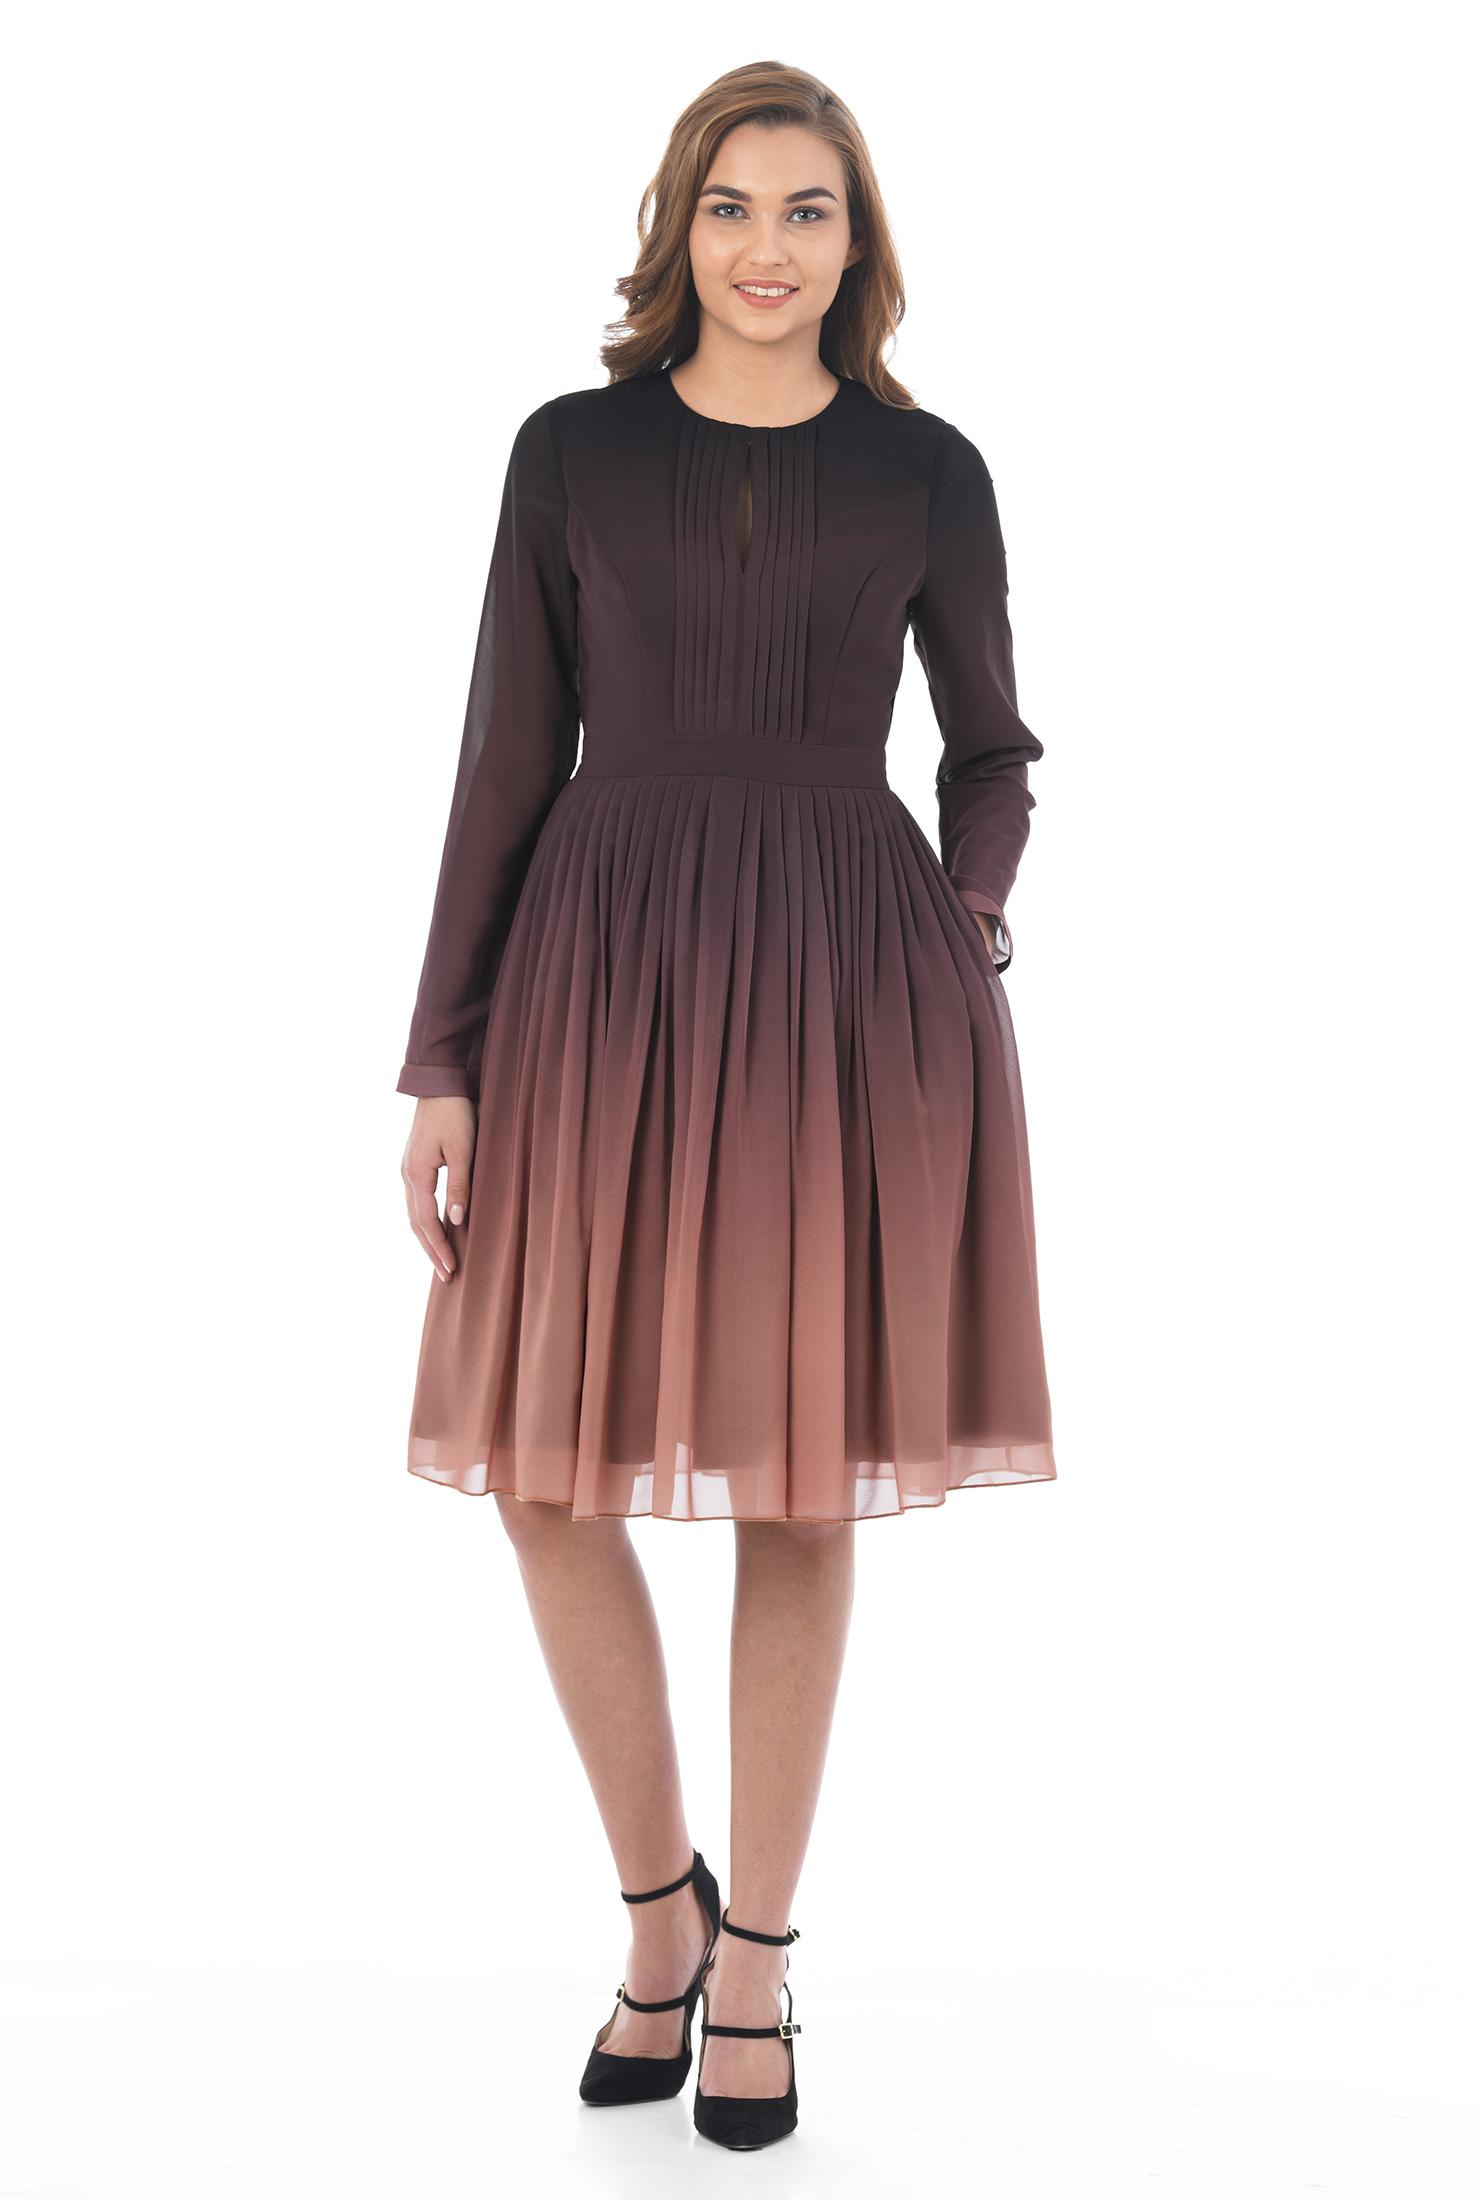 a3054b2ce7 Women s Fashion Clothing 0-36W and Custom